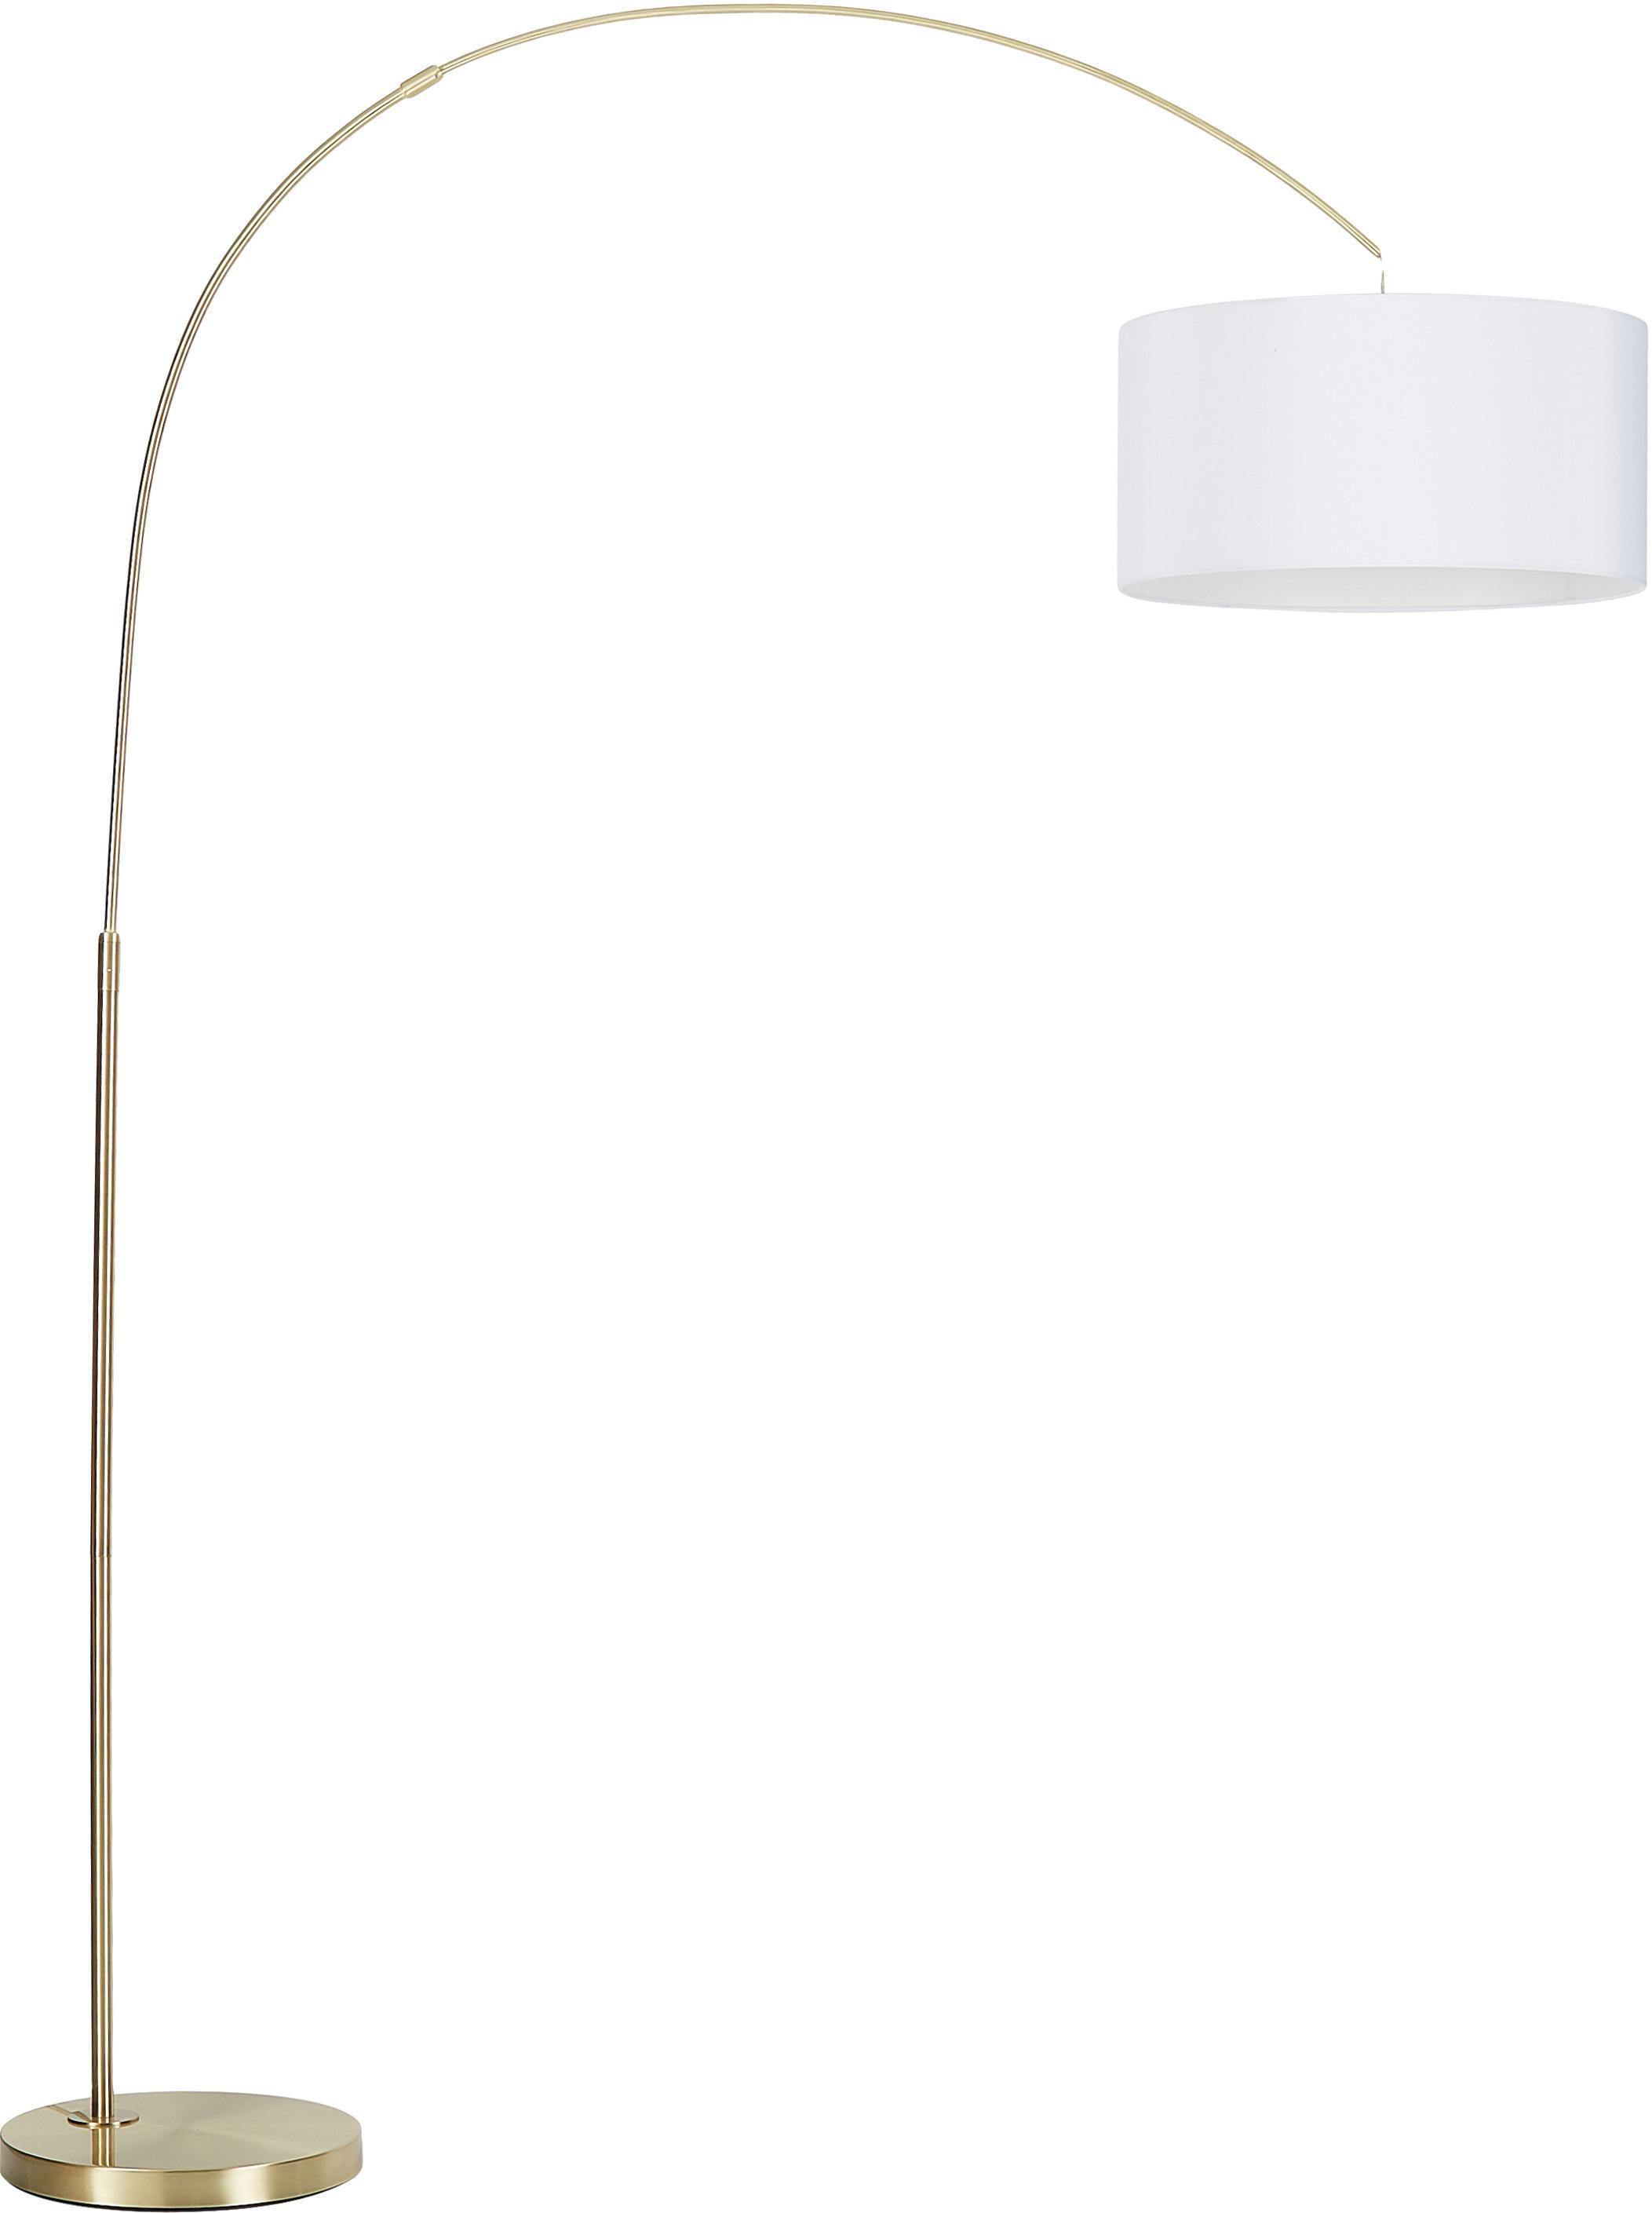 Lámpara arco Niels, Pantalla: mezcla de algodón, Cable: plástico, Blanco, latón, An 157 x Al 218 cm